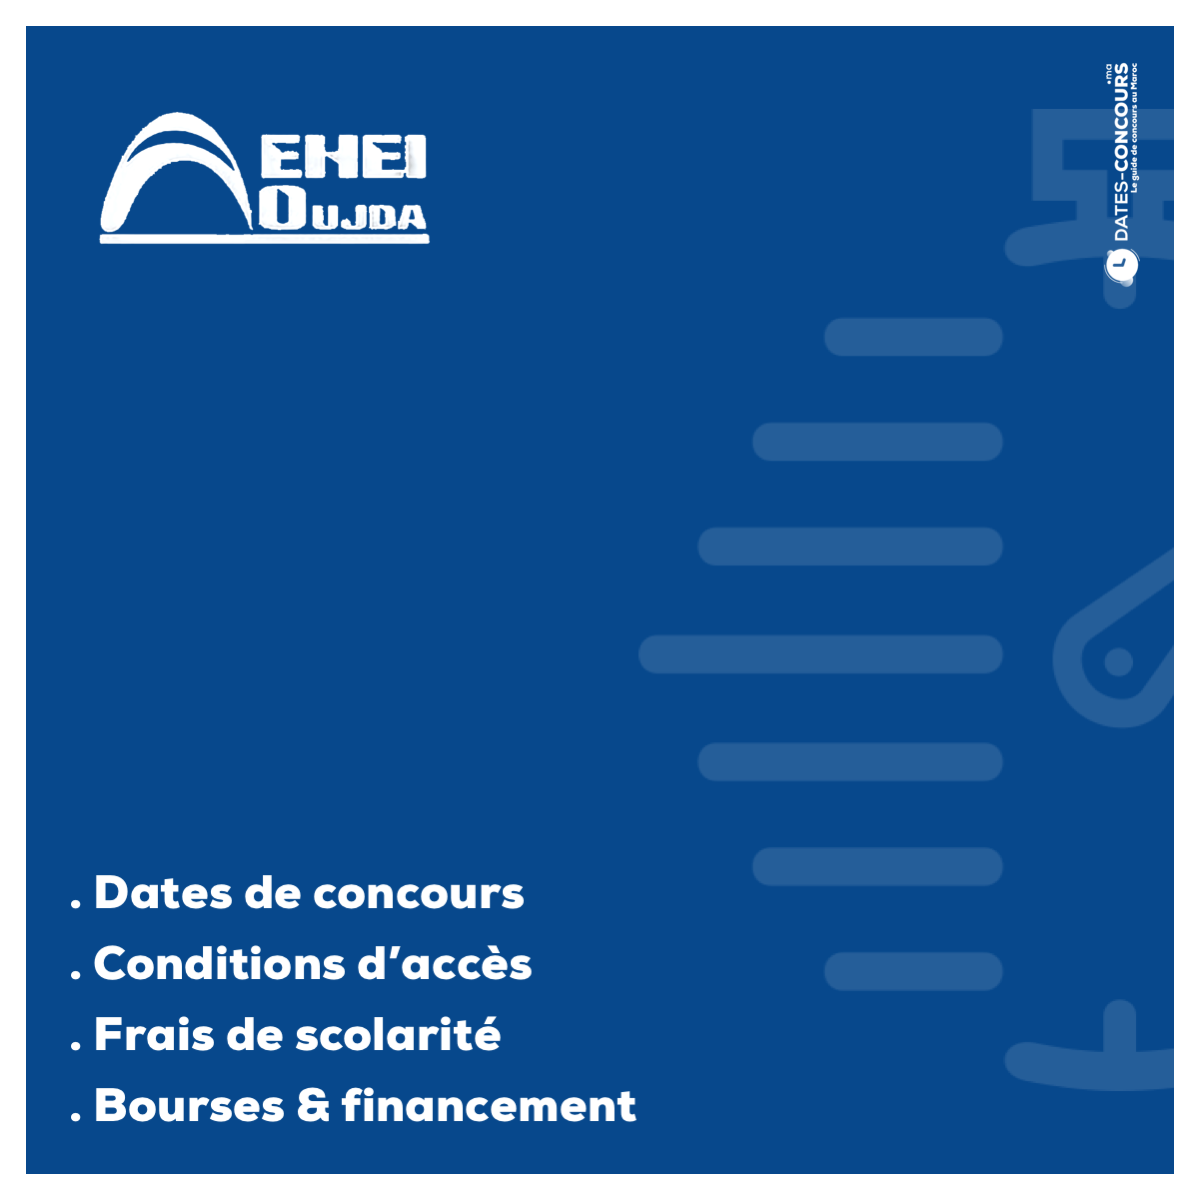 EHEIO - Dates-concours.ma